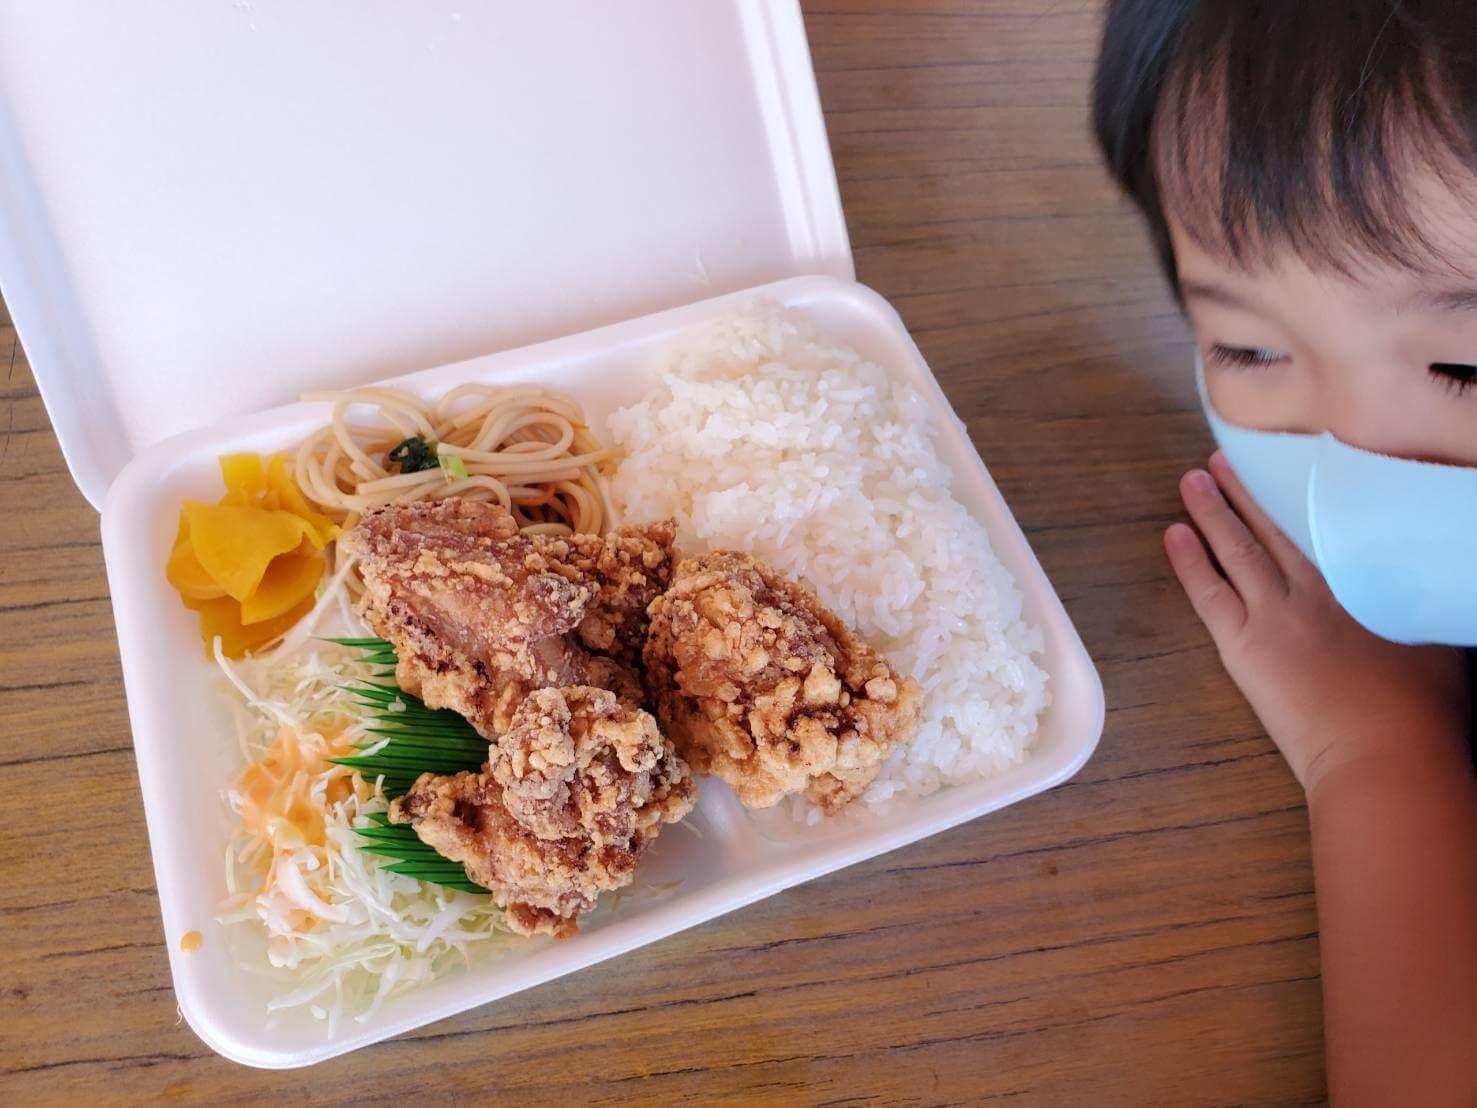 【KITCHEN はなや】安くてボリューム満点!イチオシの唐揚げ弁当《熊本市西区池田》